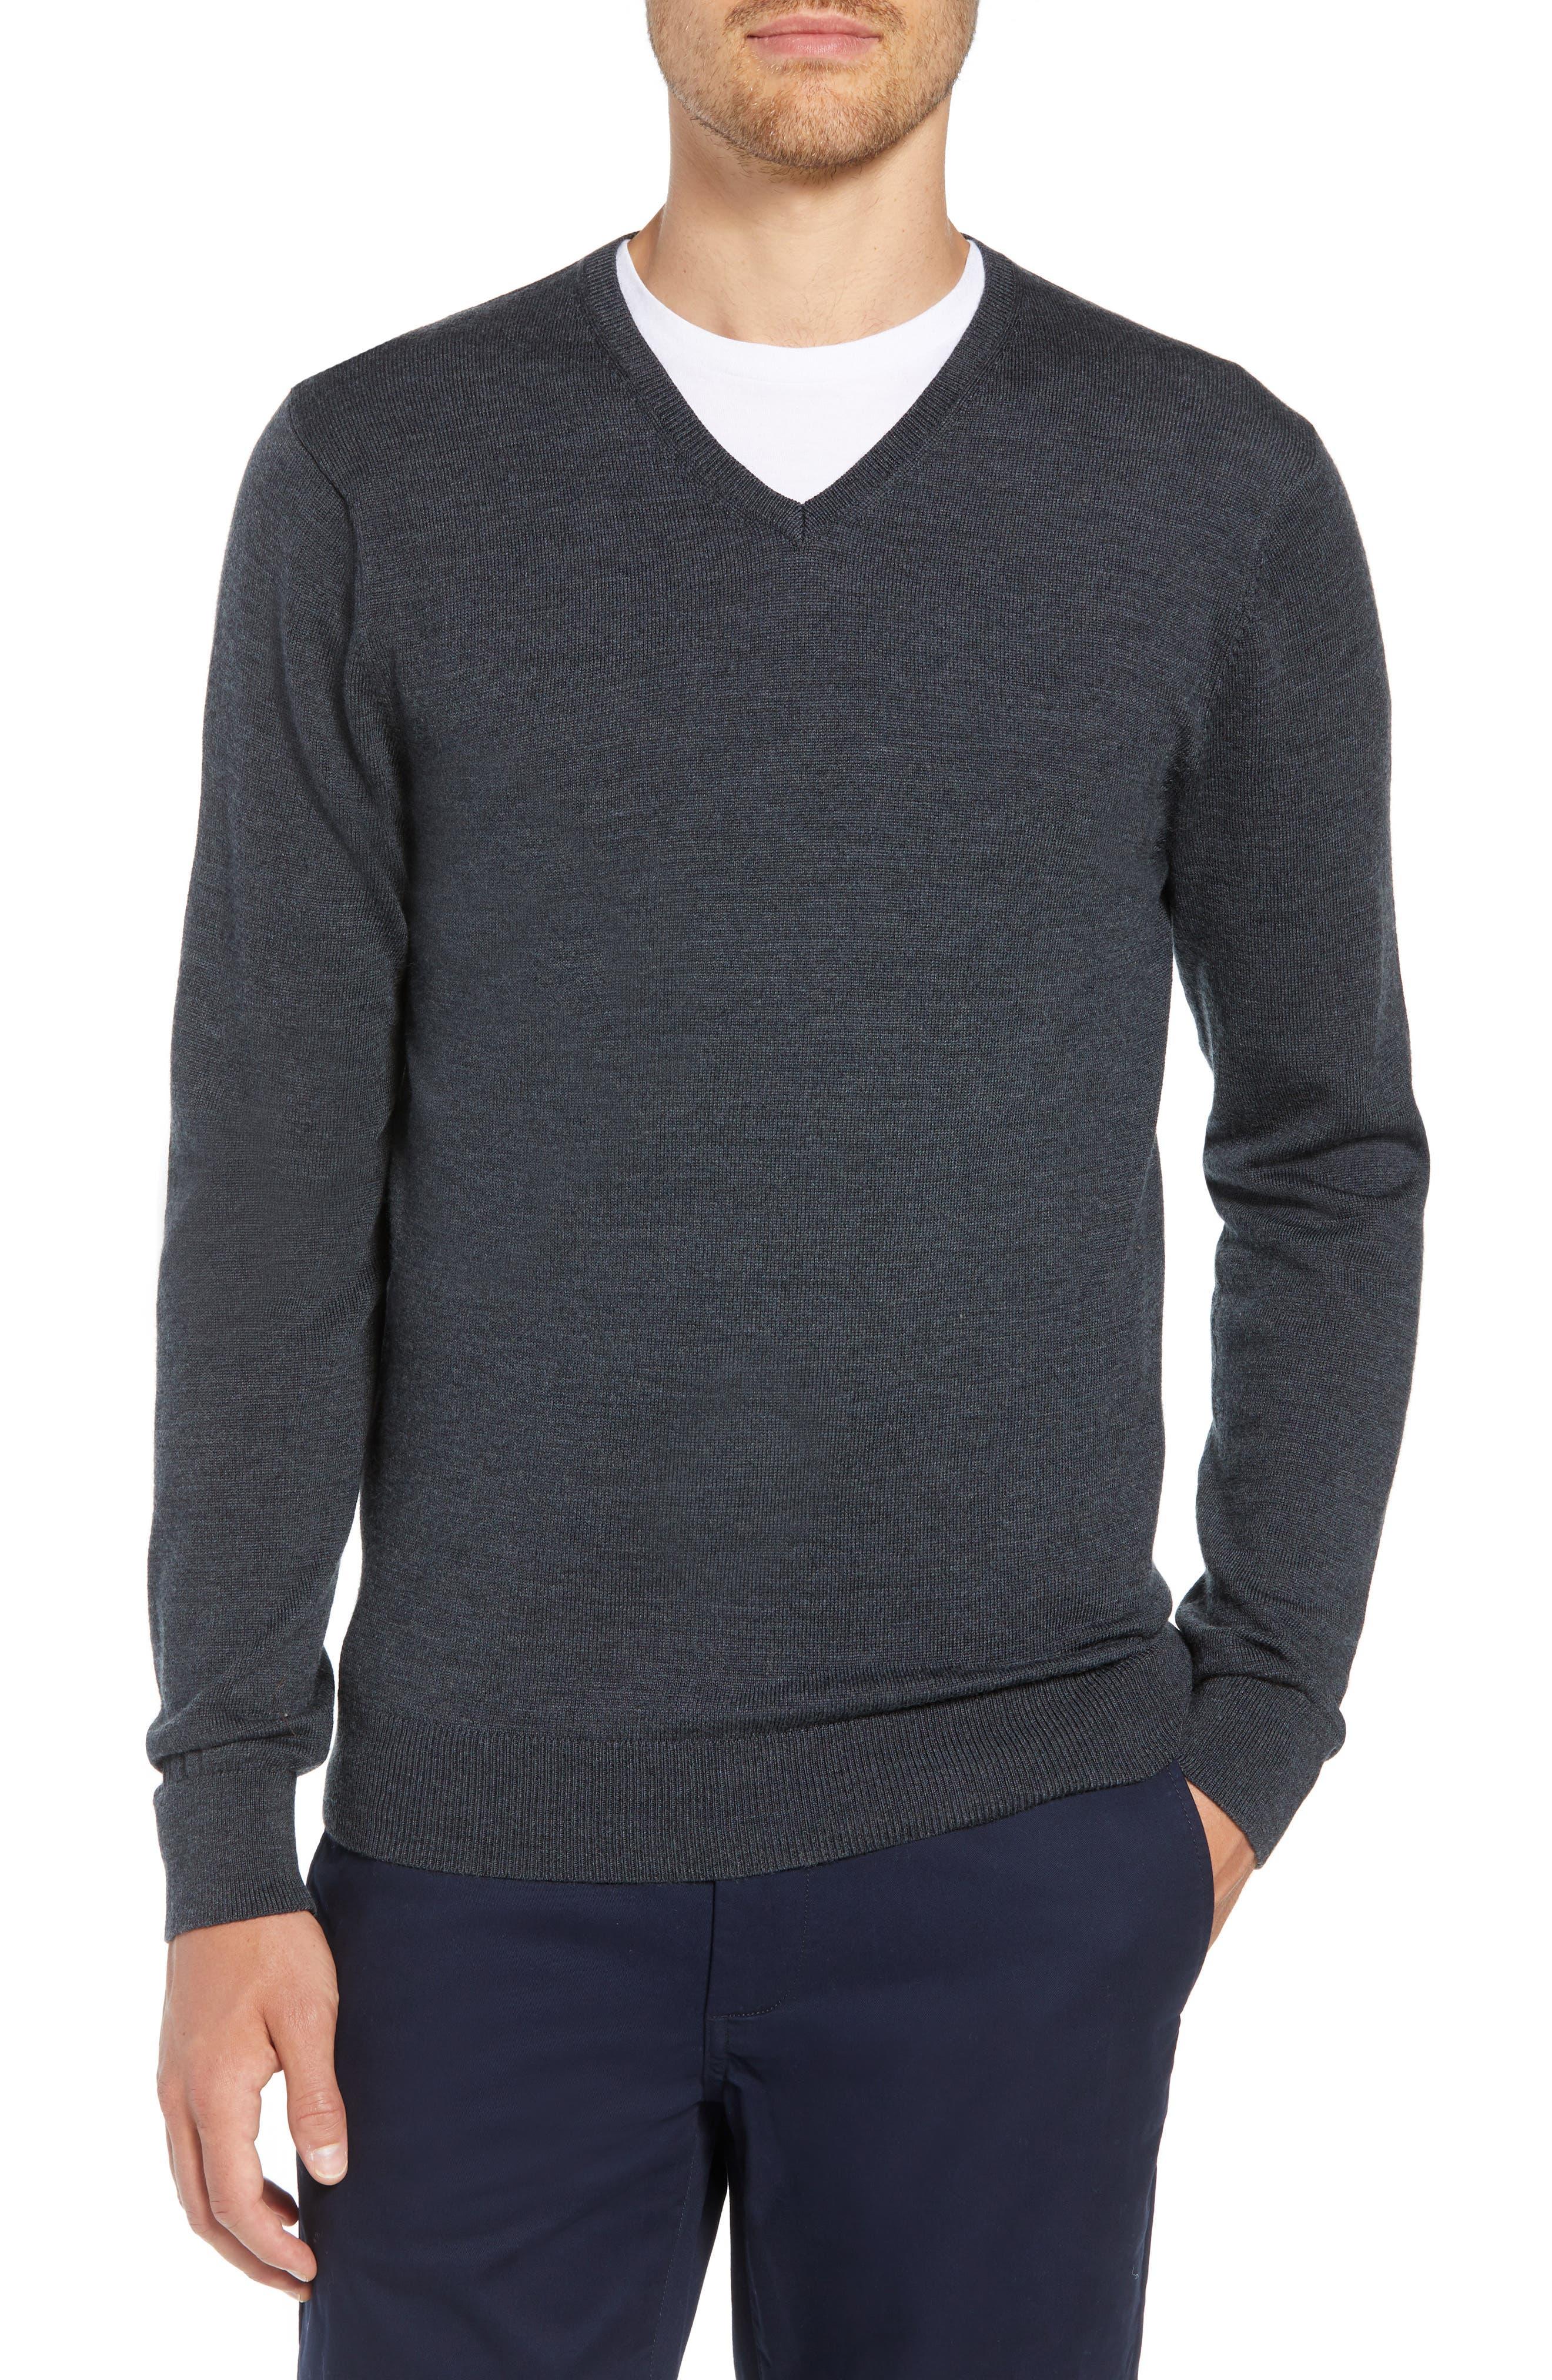 Bonobos Slim Fit V-Neck Merino Wool Sweater, Grey